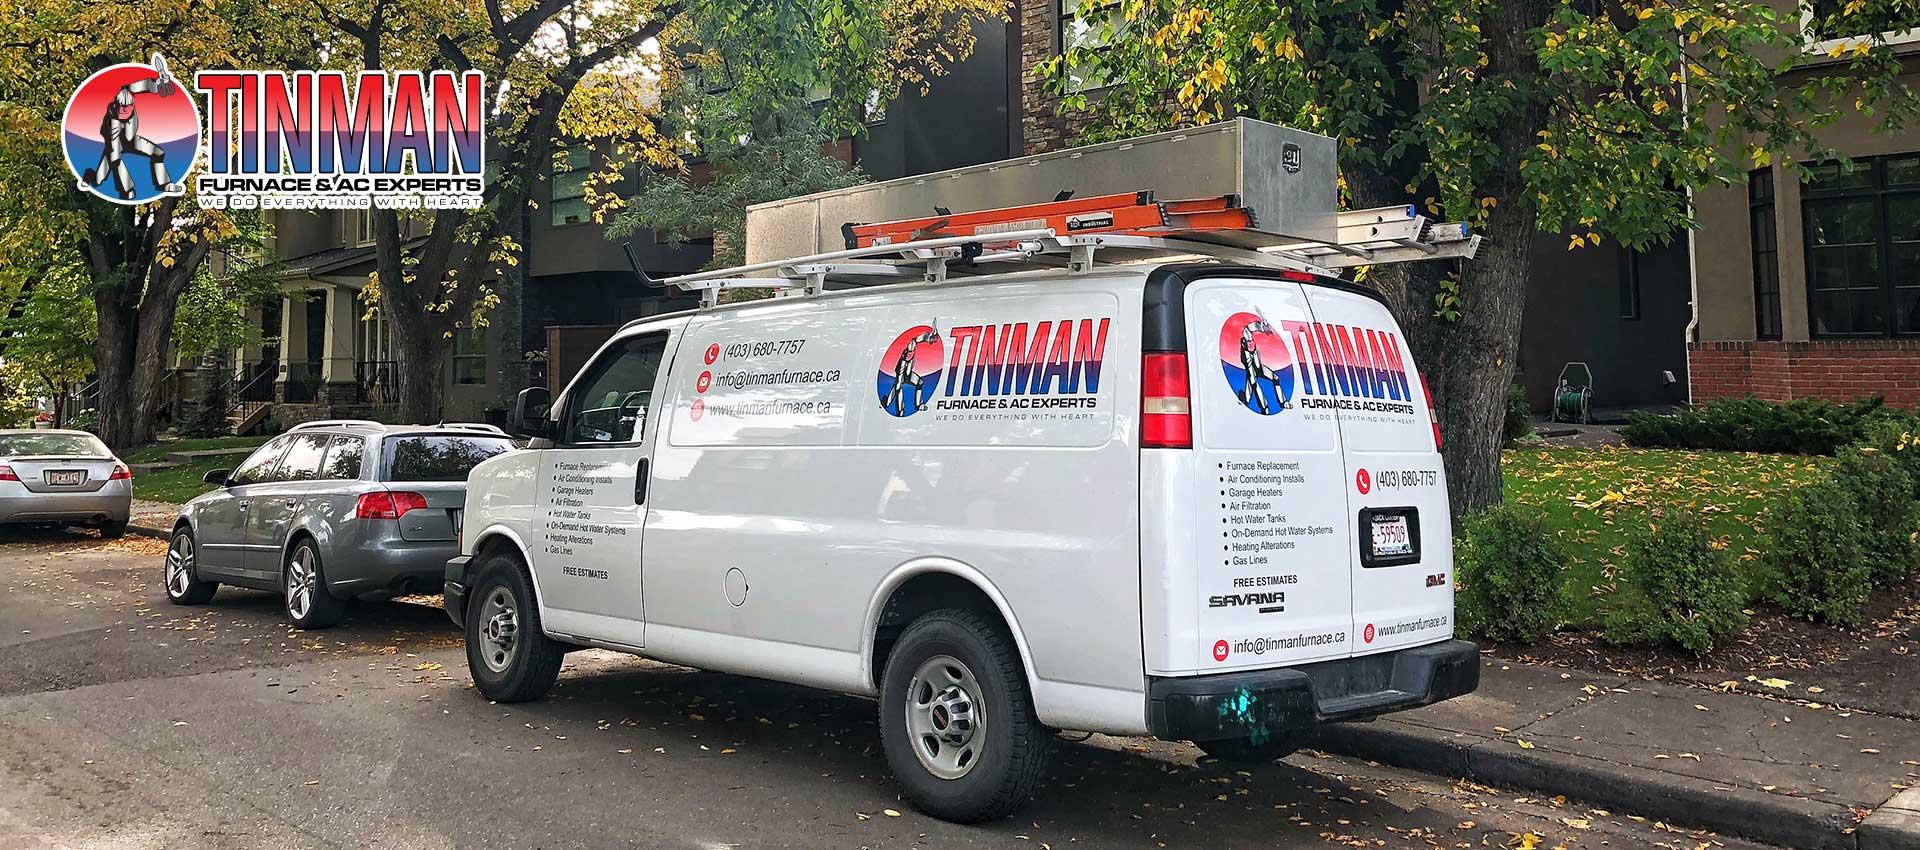 Tinman Furnace Van | Calgary Furnace Heating & Air Conditioning